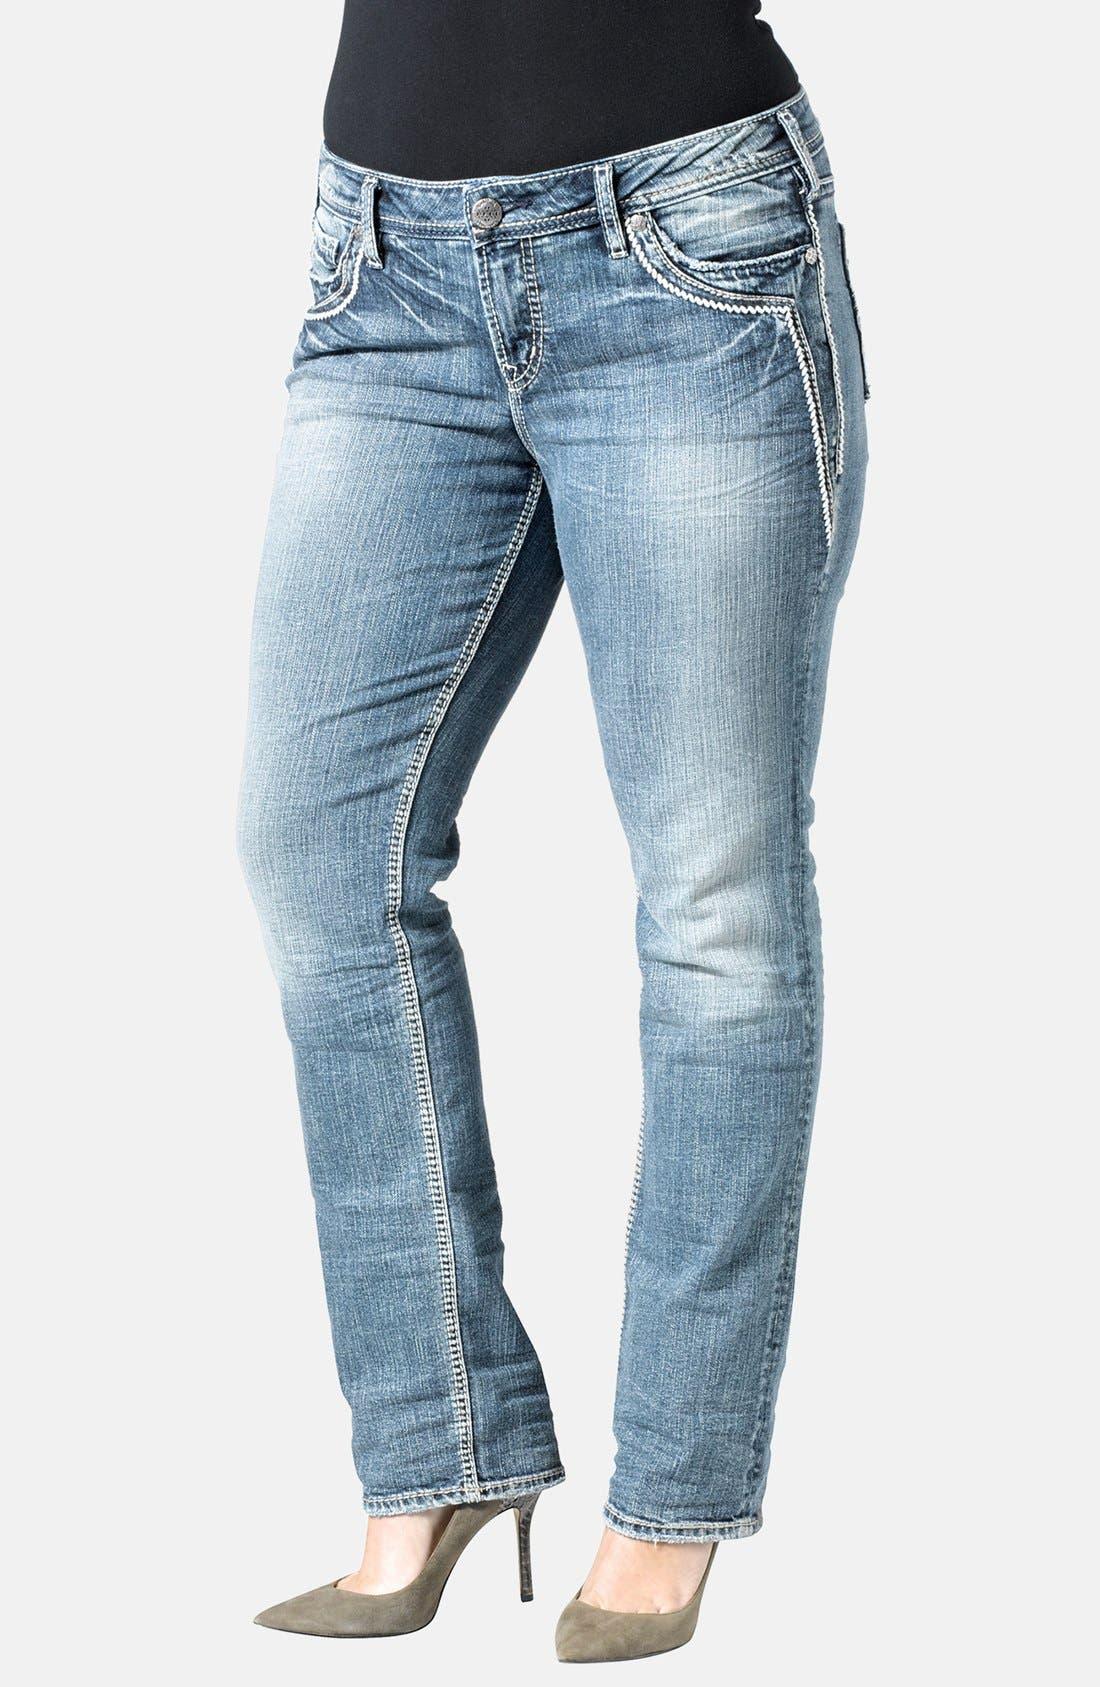 Main Image - Silver Jeans Co. 'Aiko' Straight Leg Jeans (Indigo) (Plus Size)